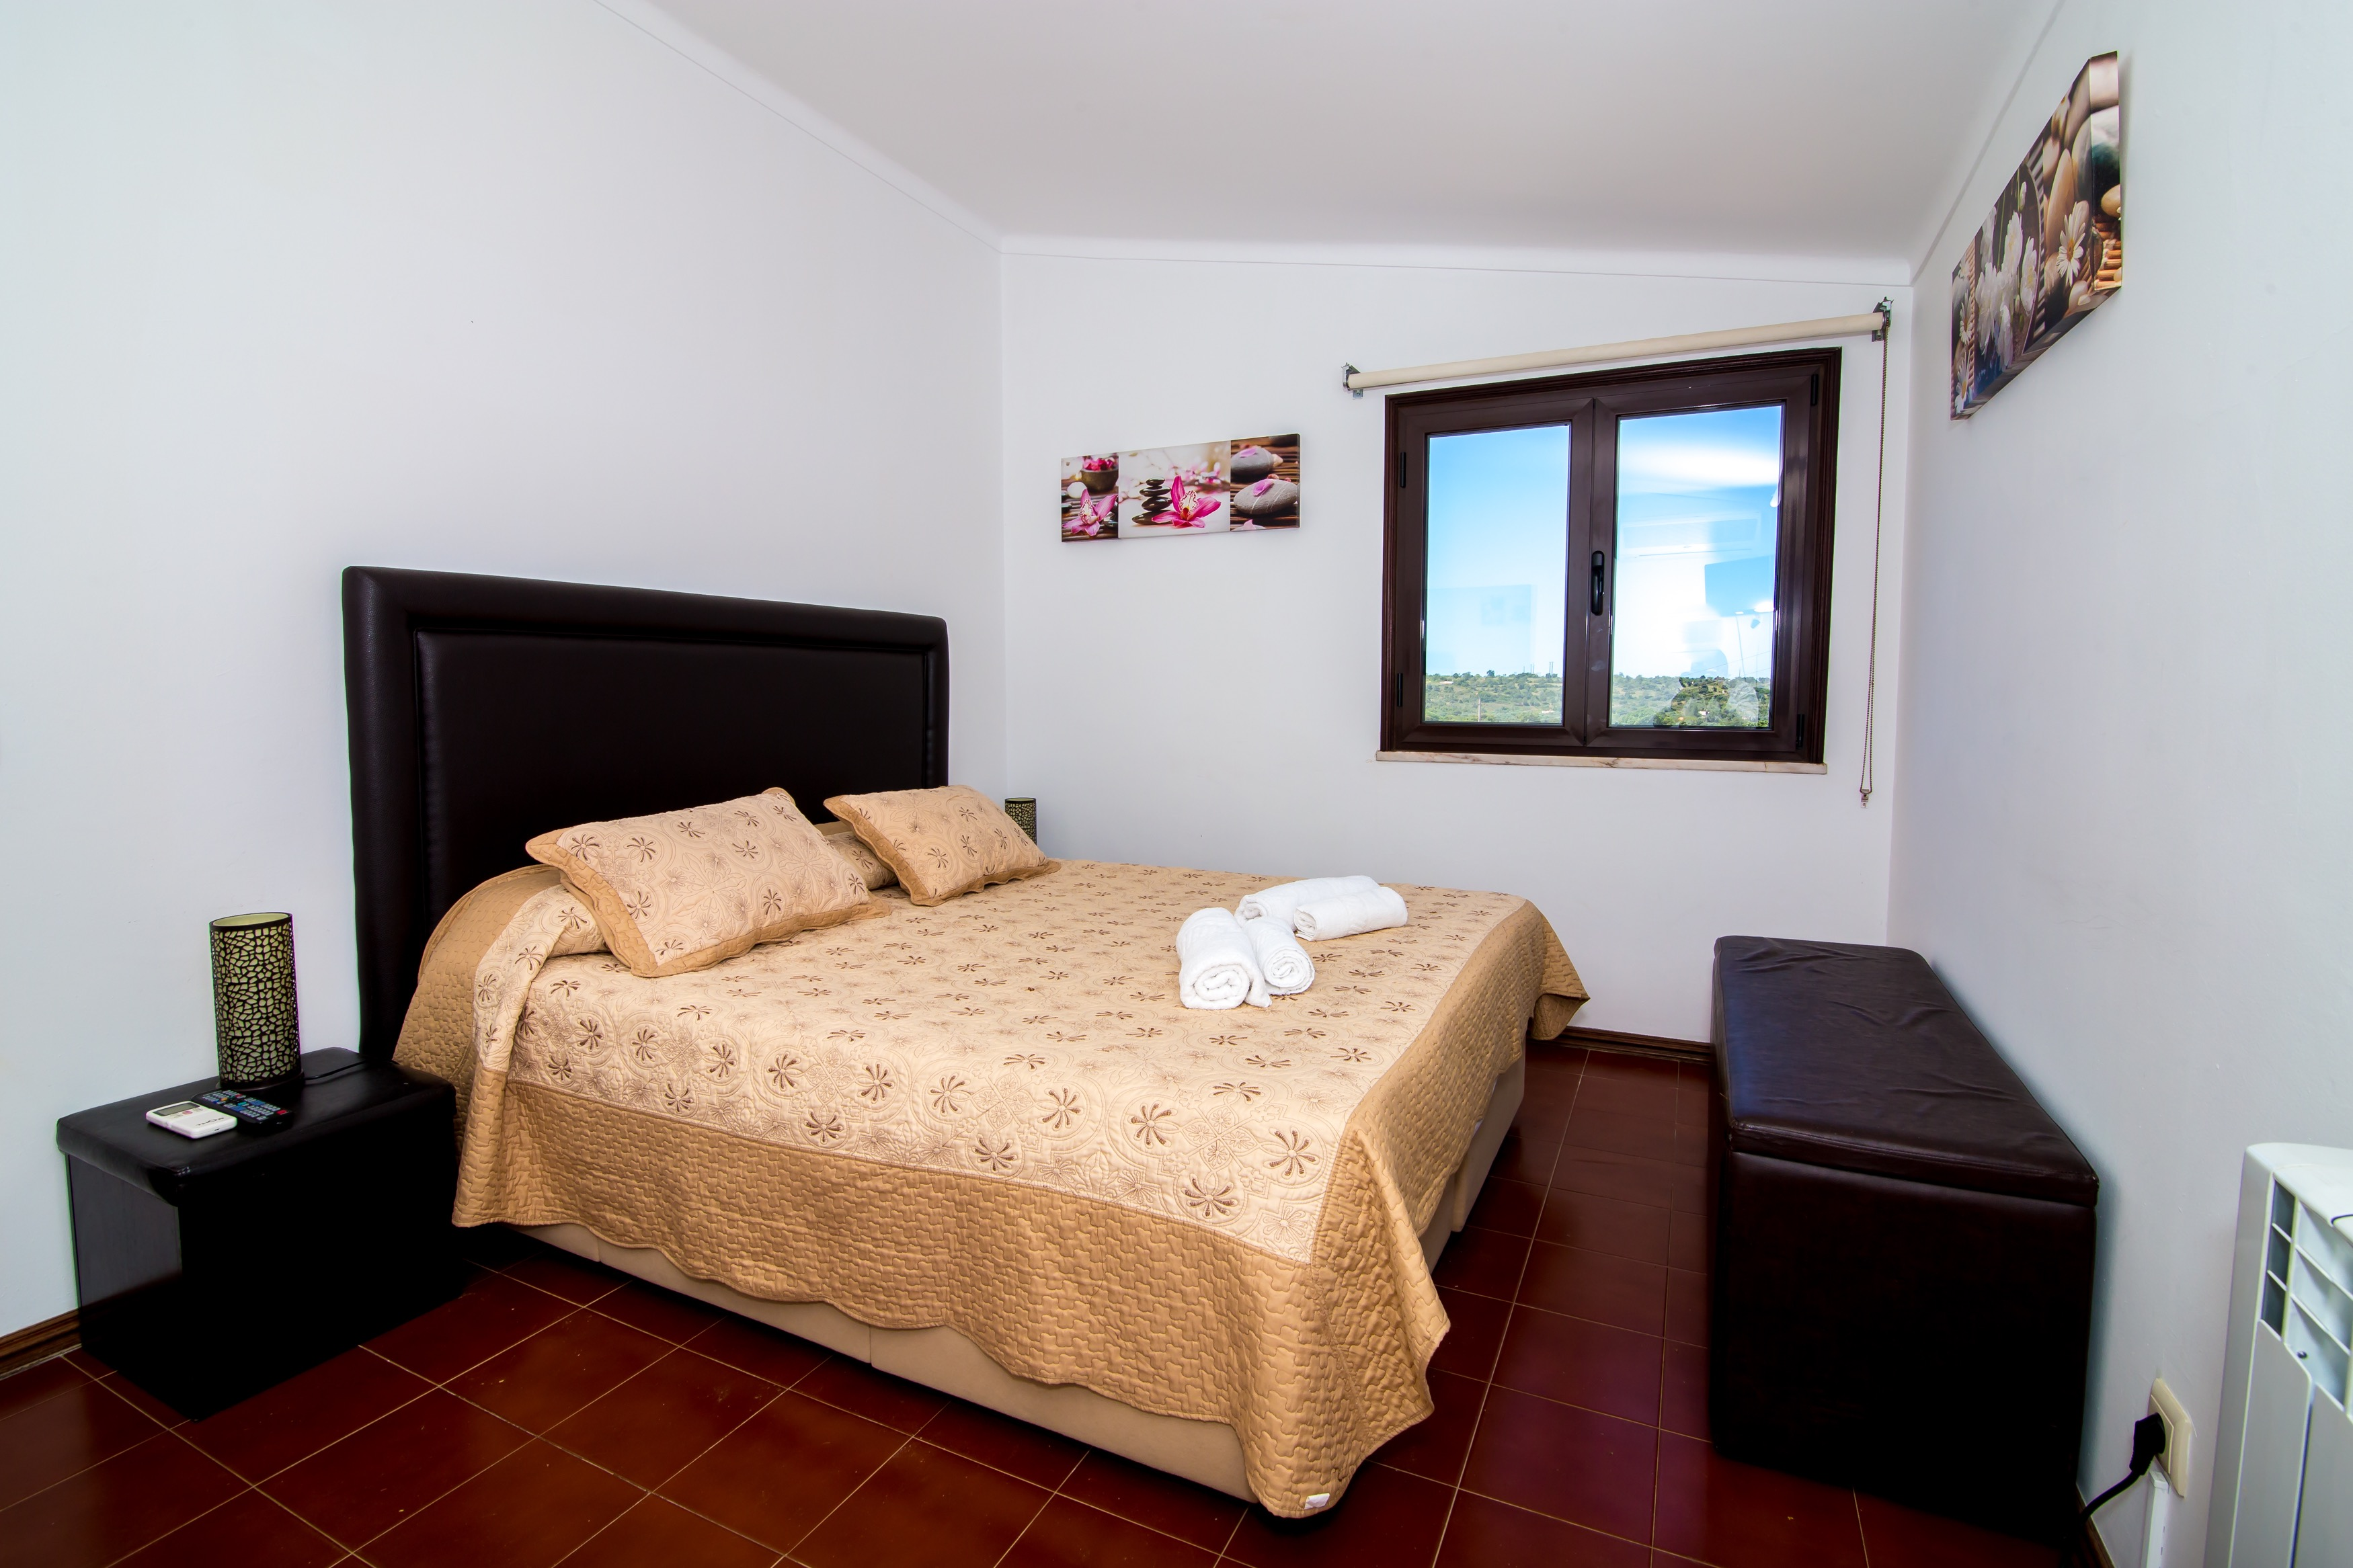 Location appartements et villas de vacance, Villa Barrancos à Guia, Portugal Algarve, REF_IMG_5770_5781